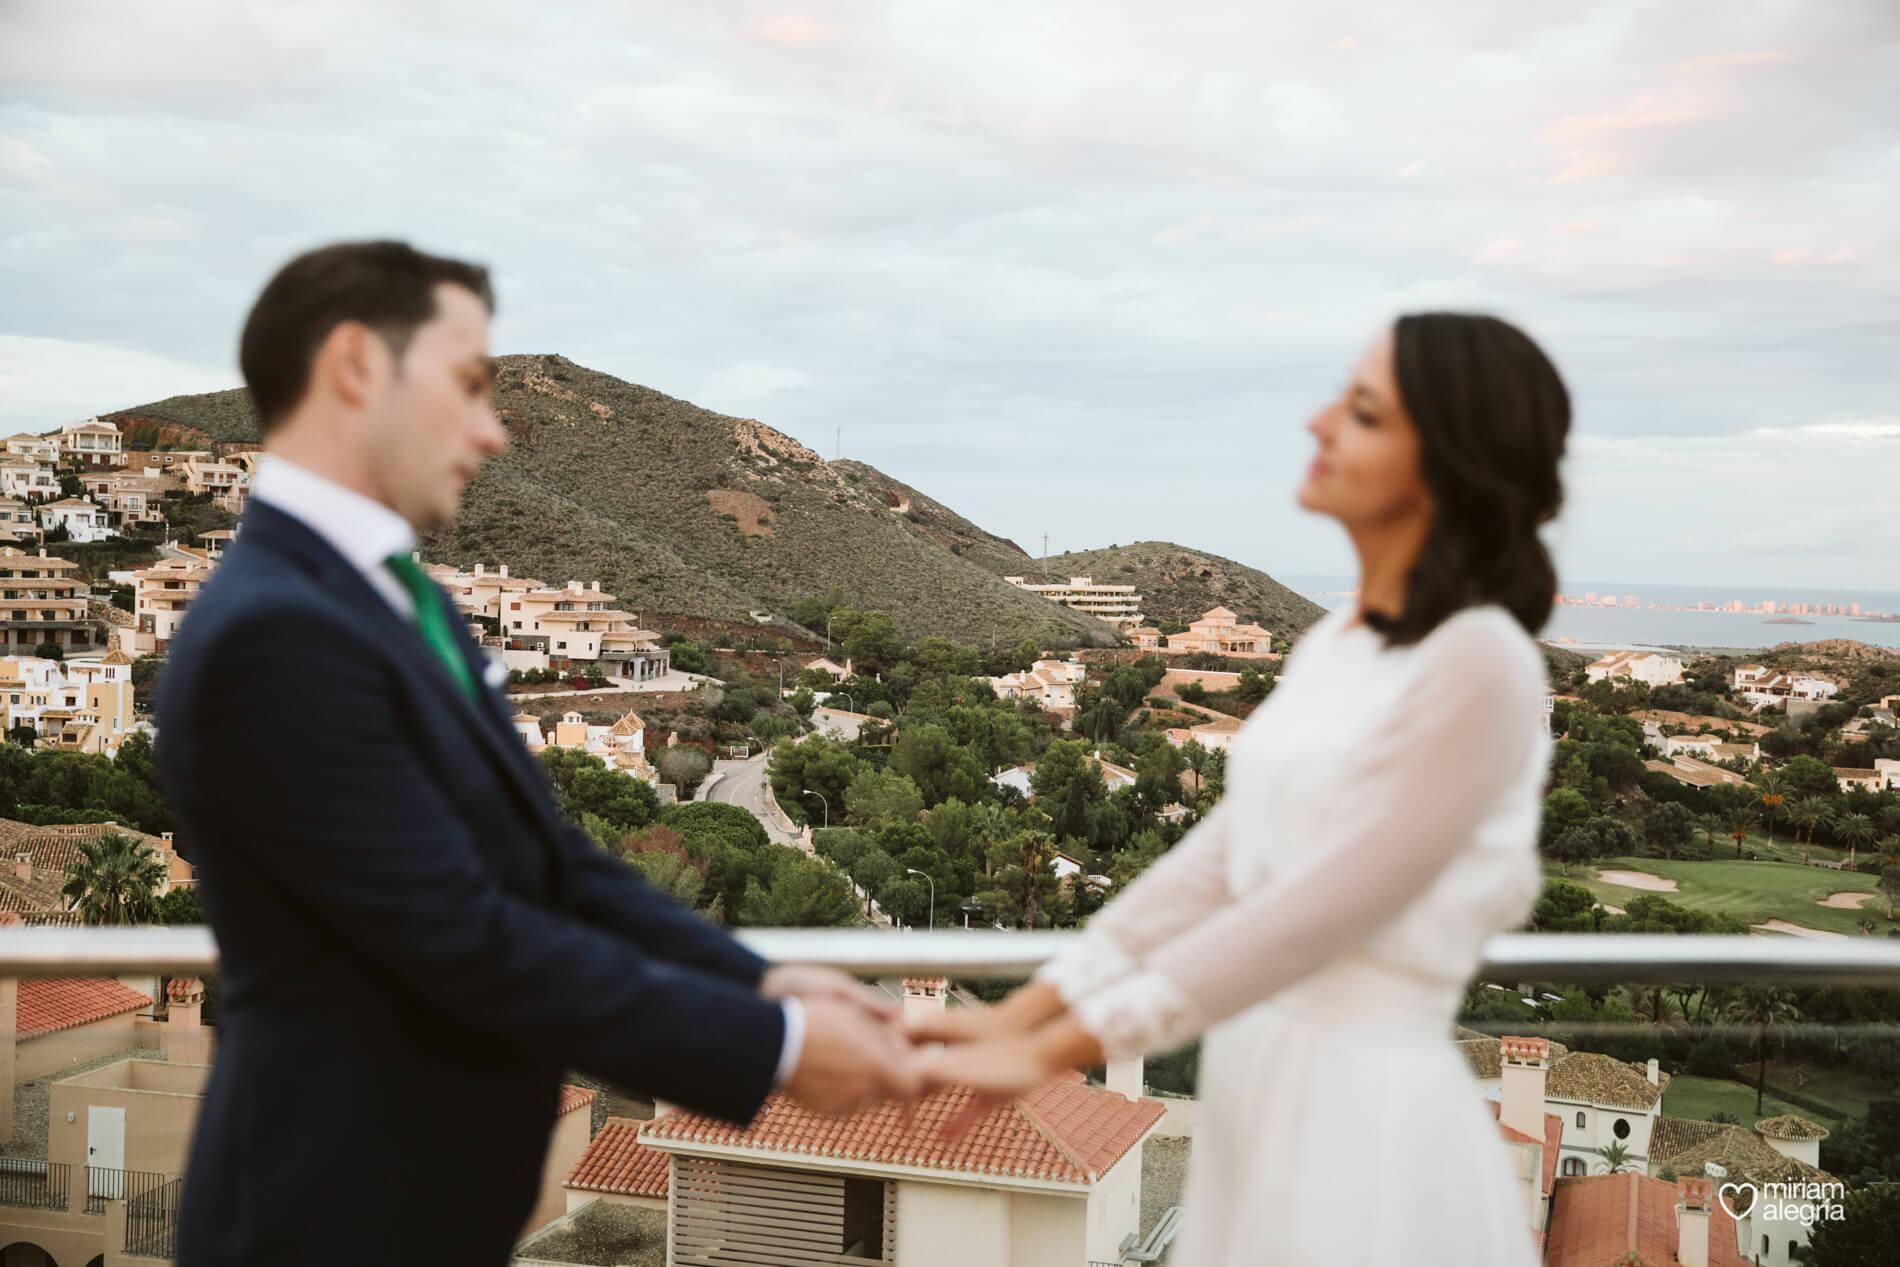 boda-en-iglesia-del-carmen-cartagena-234